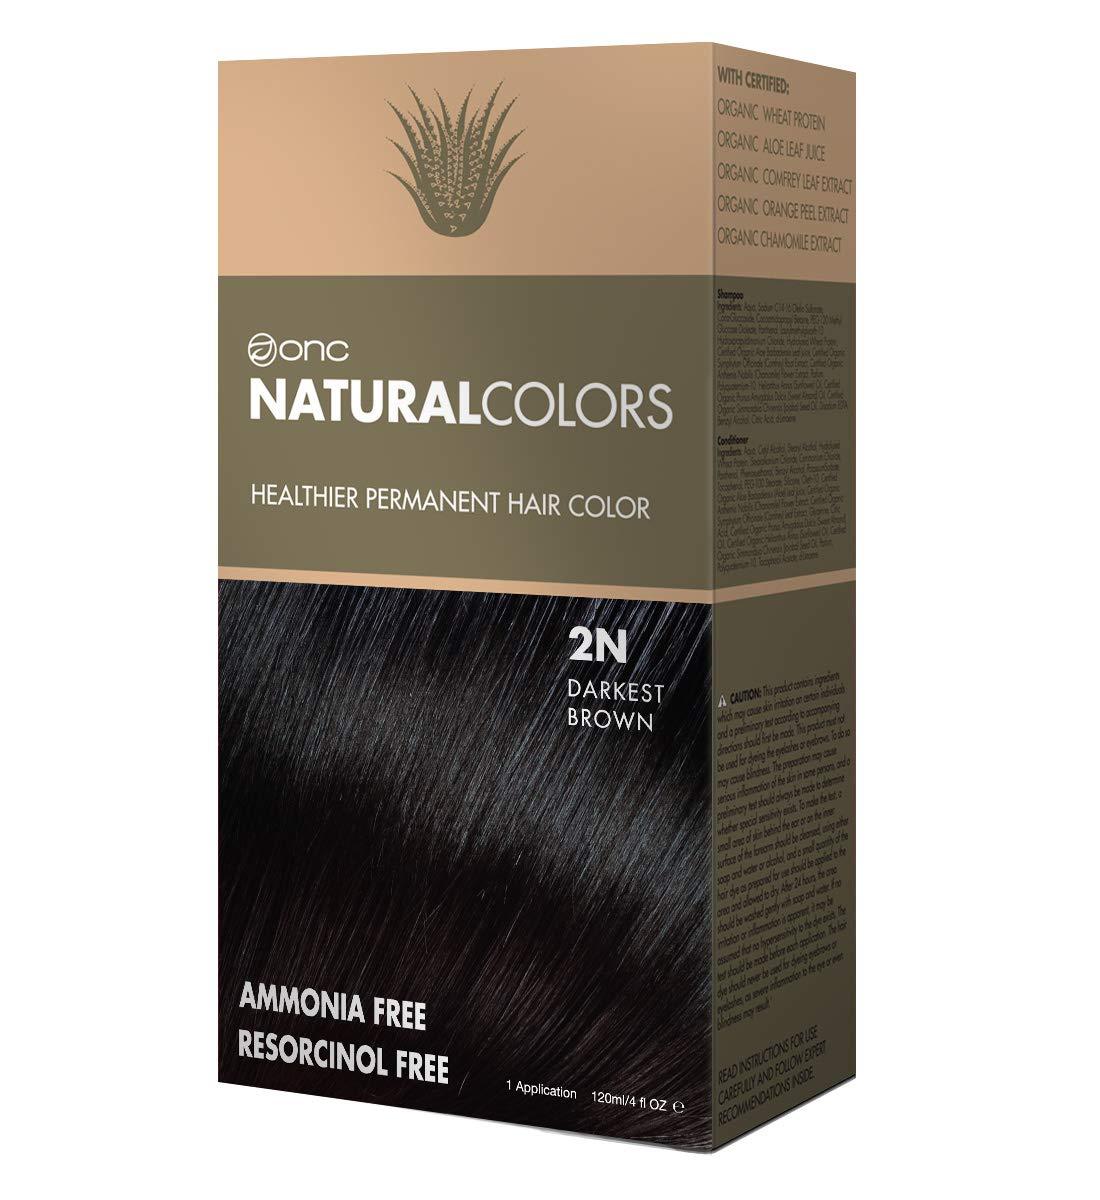 Amazon Onc Naturalcolors 2n Darkest Brown Healthier Permanent